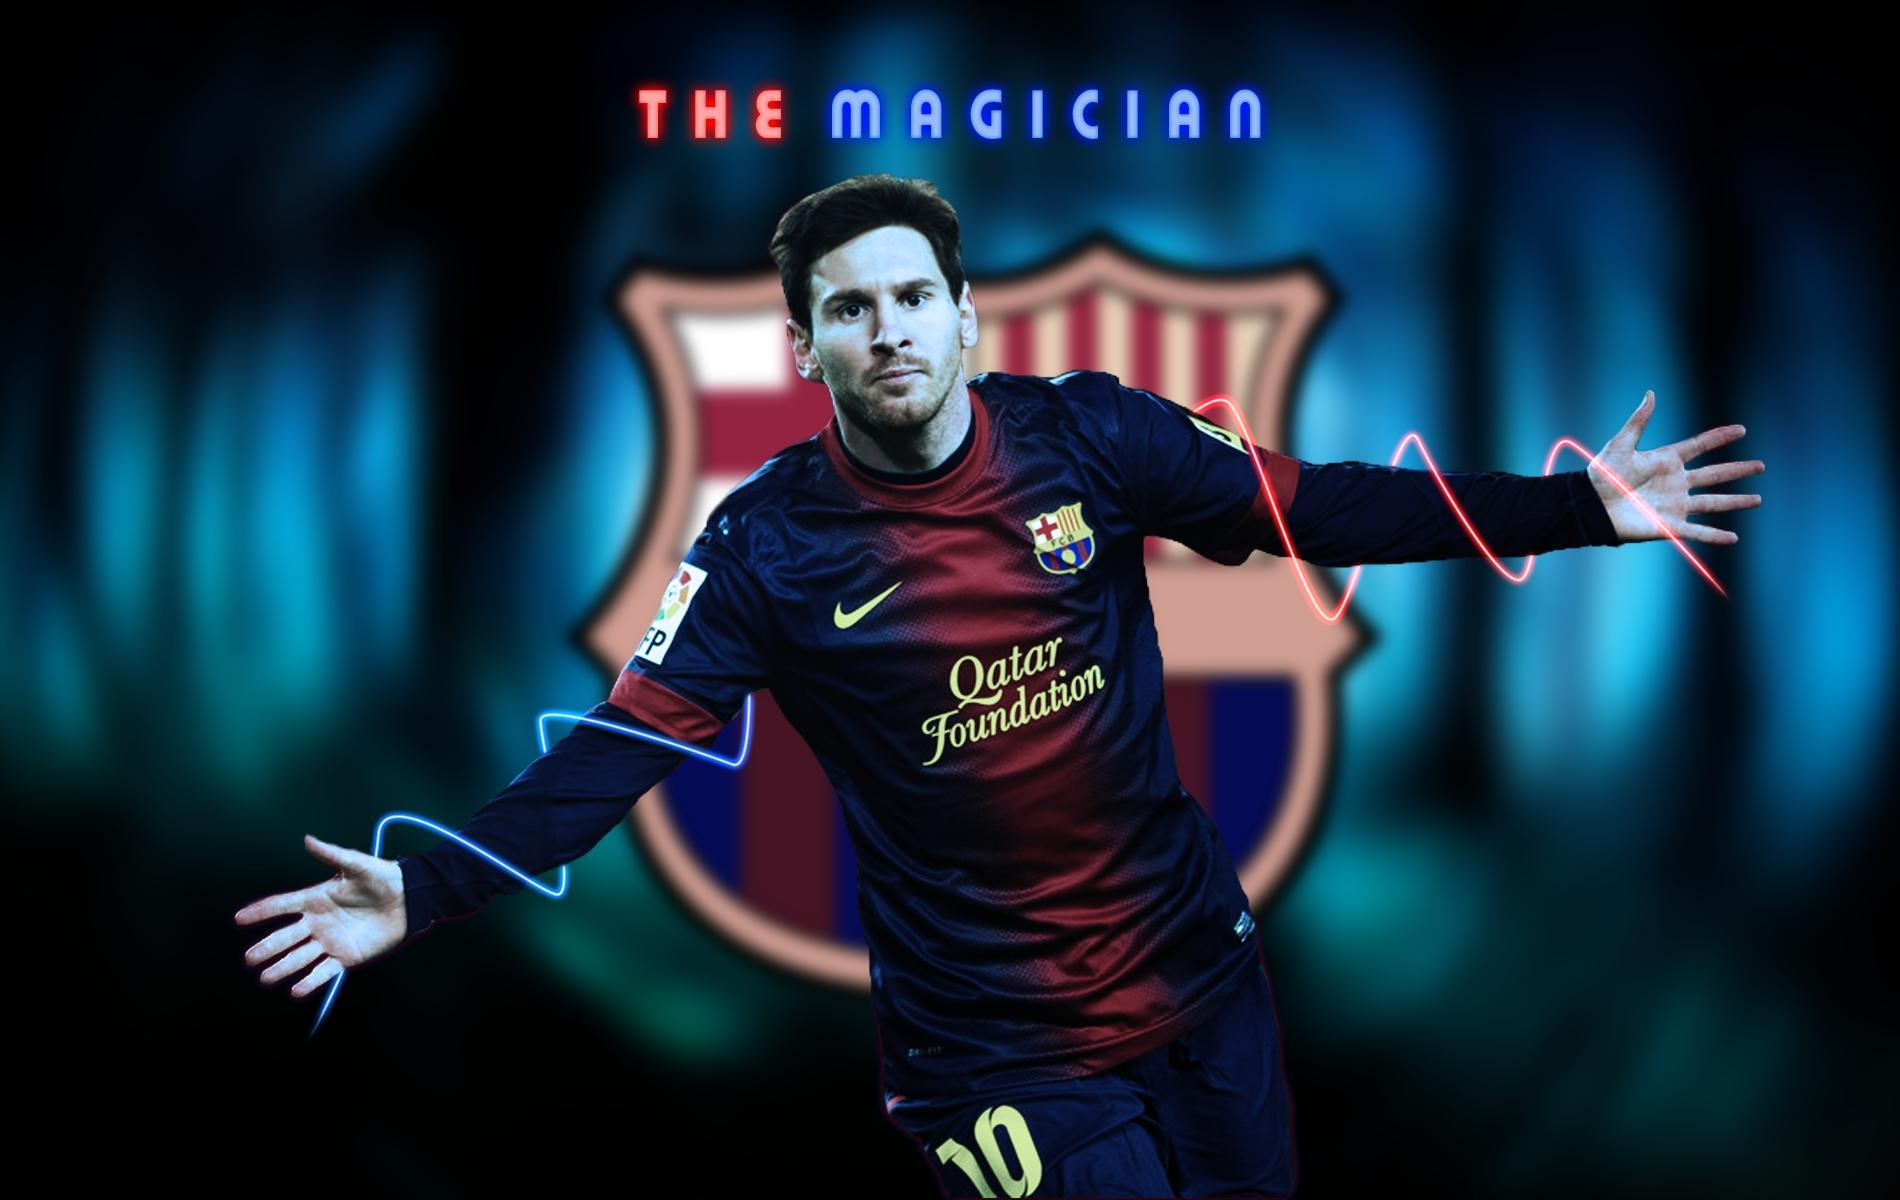 Lionel Messi Football Wallpaper